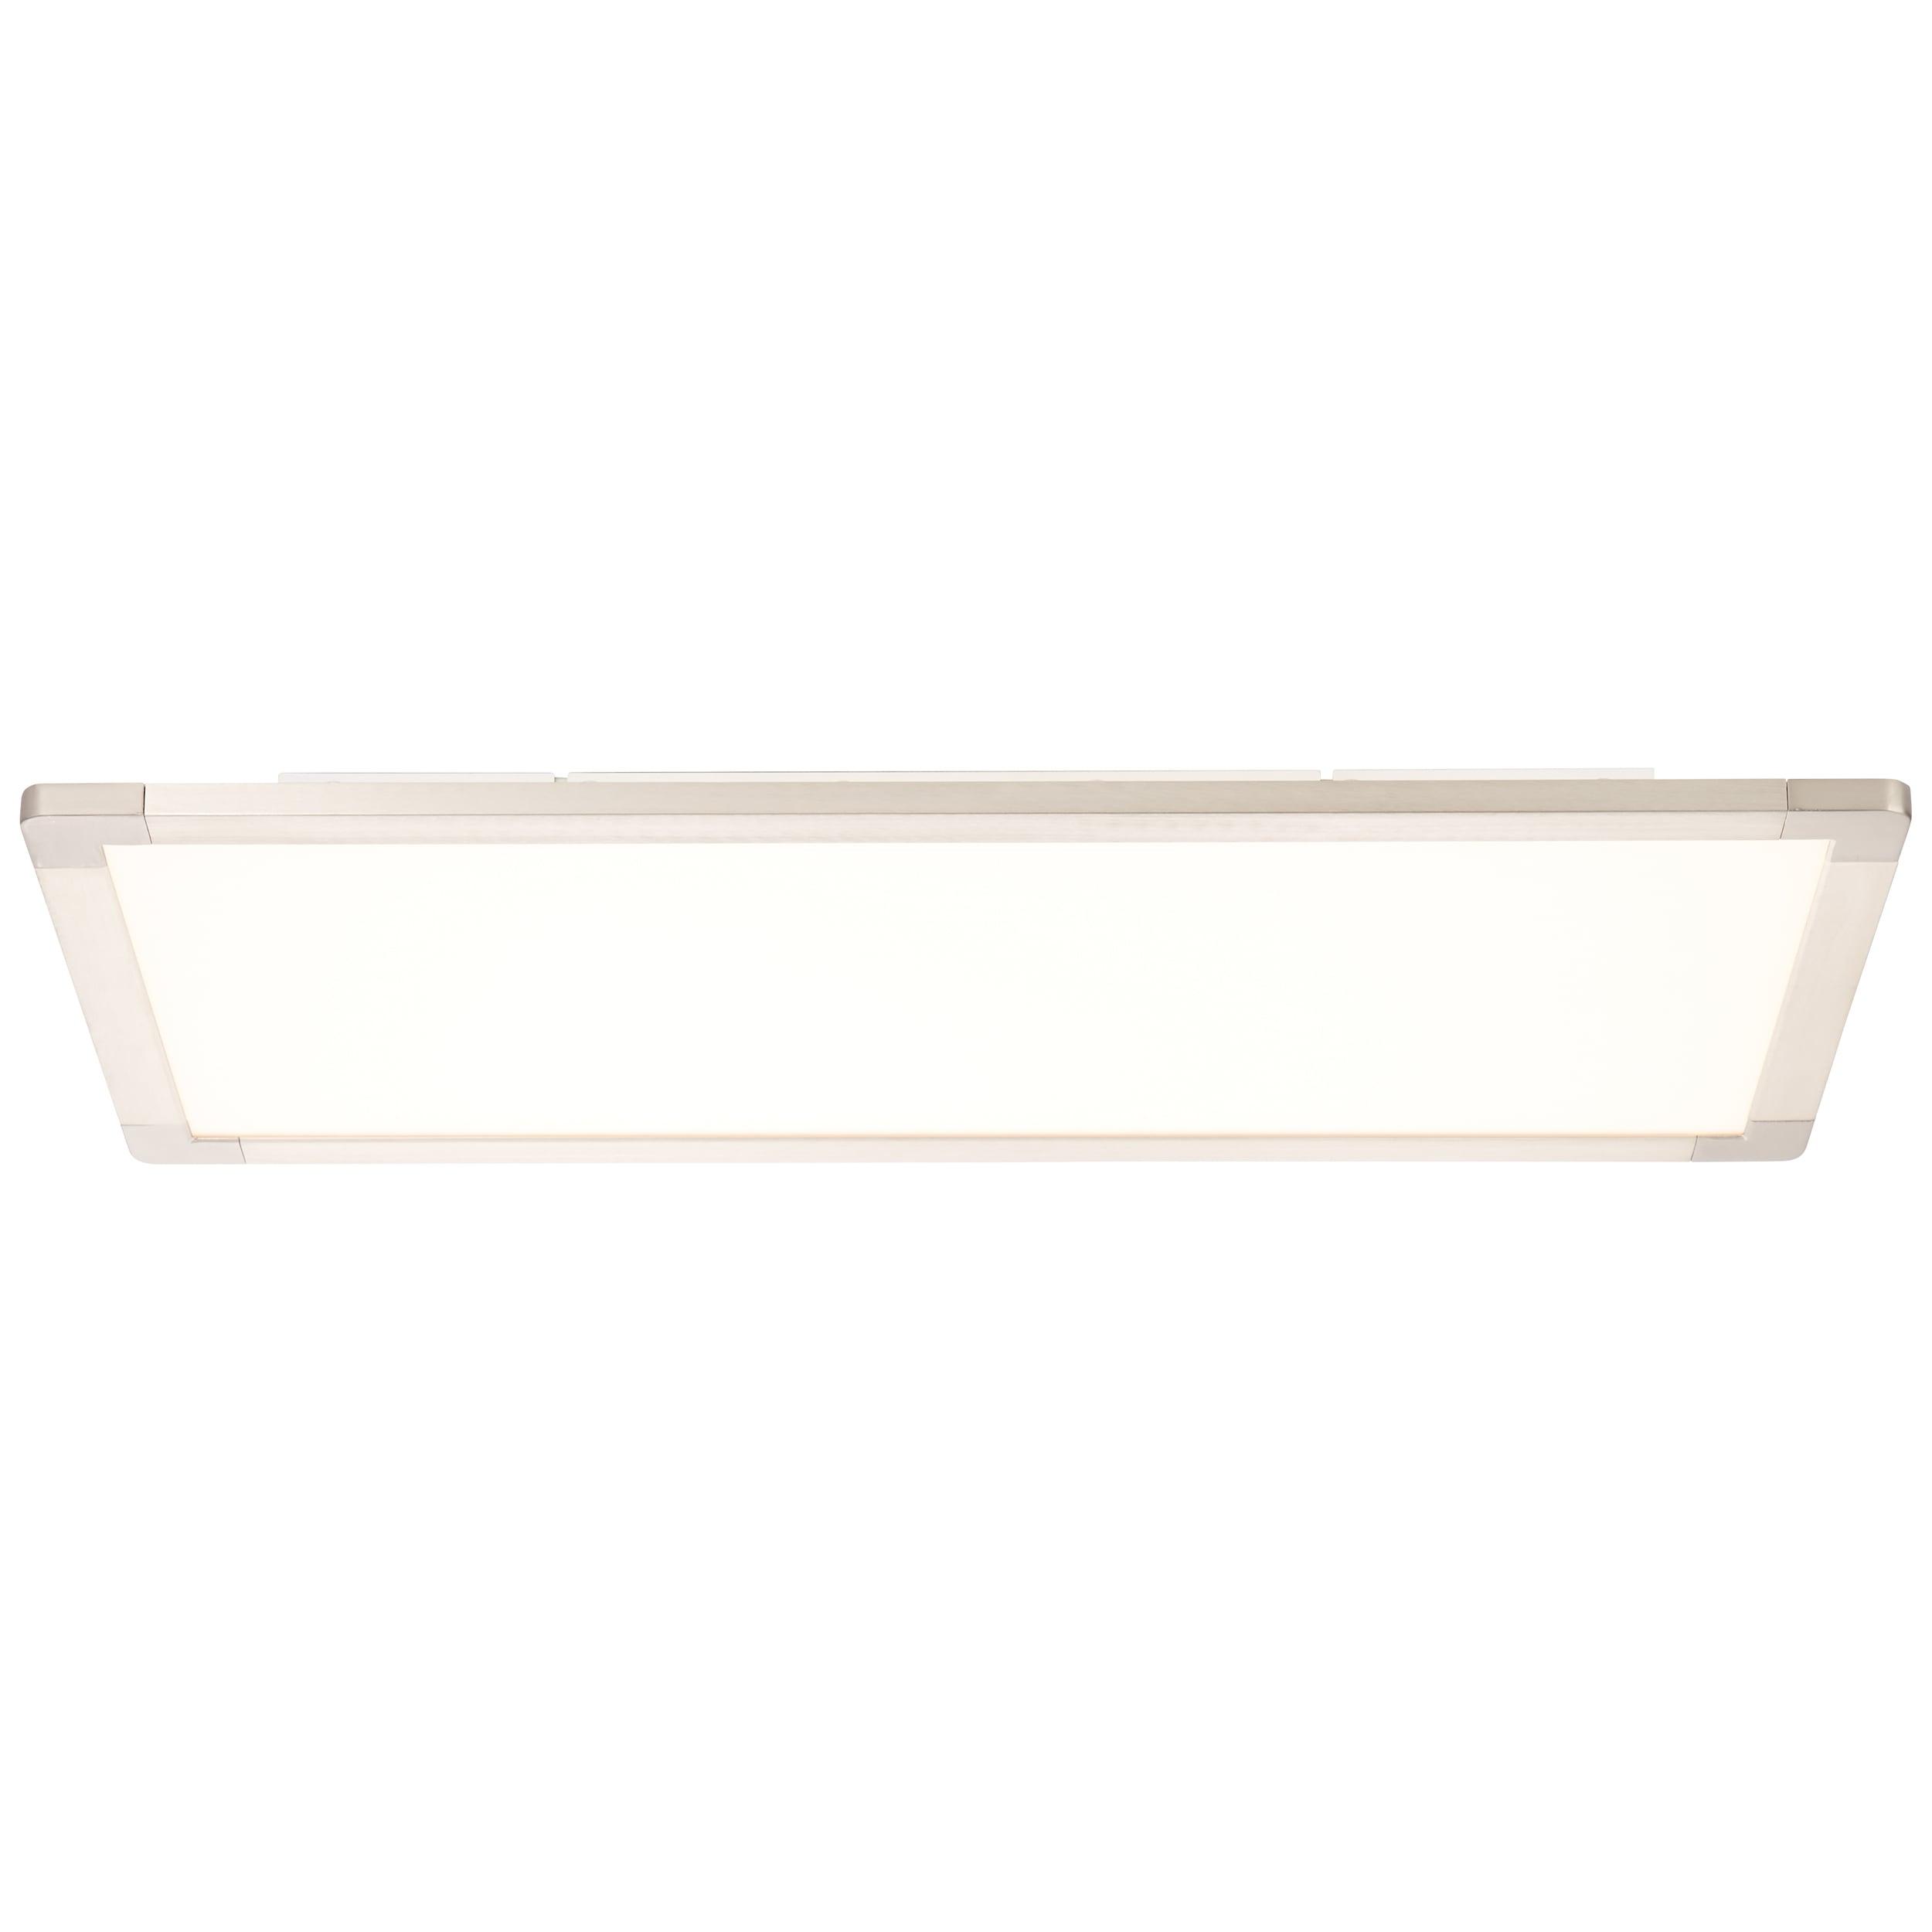 Brilliant Leuchten Smooth LED Deckenaufbau-Paneel 120x30cm silber/weiß easyDim